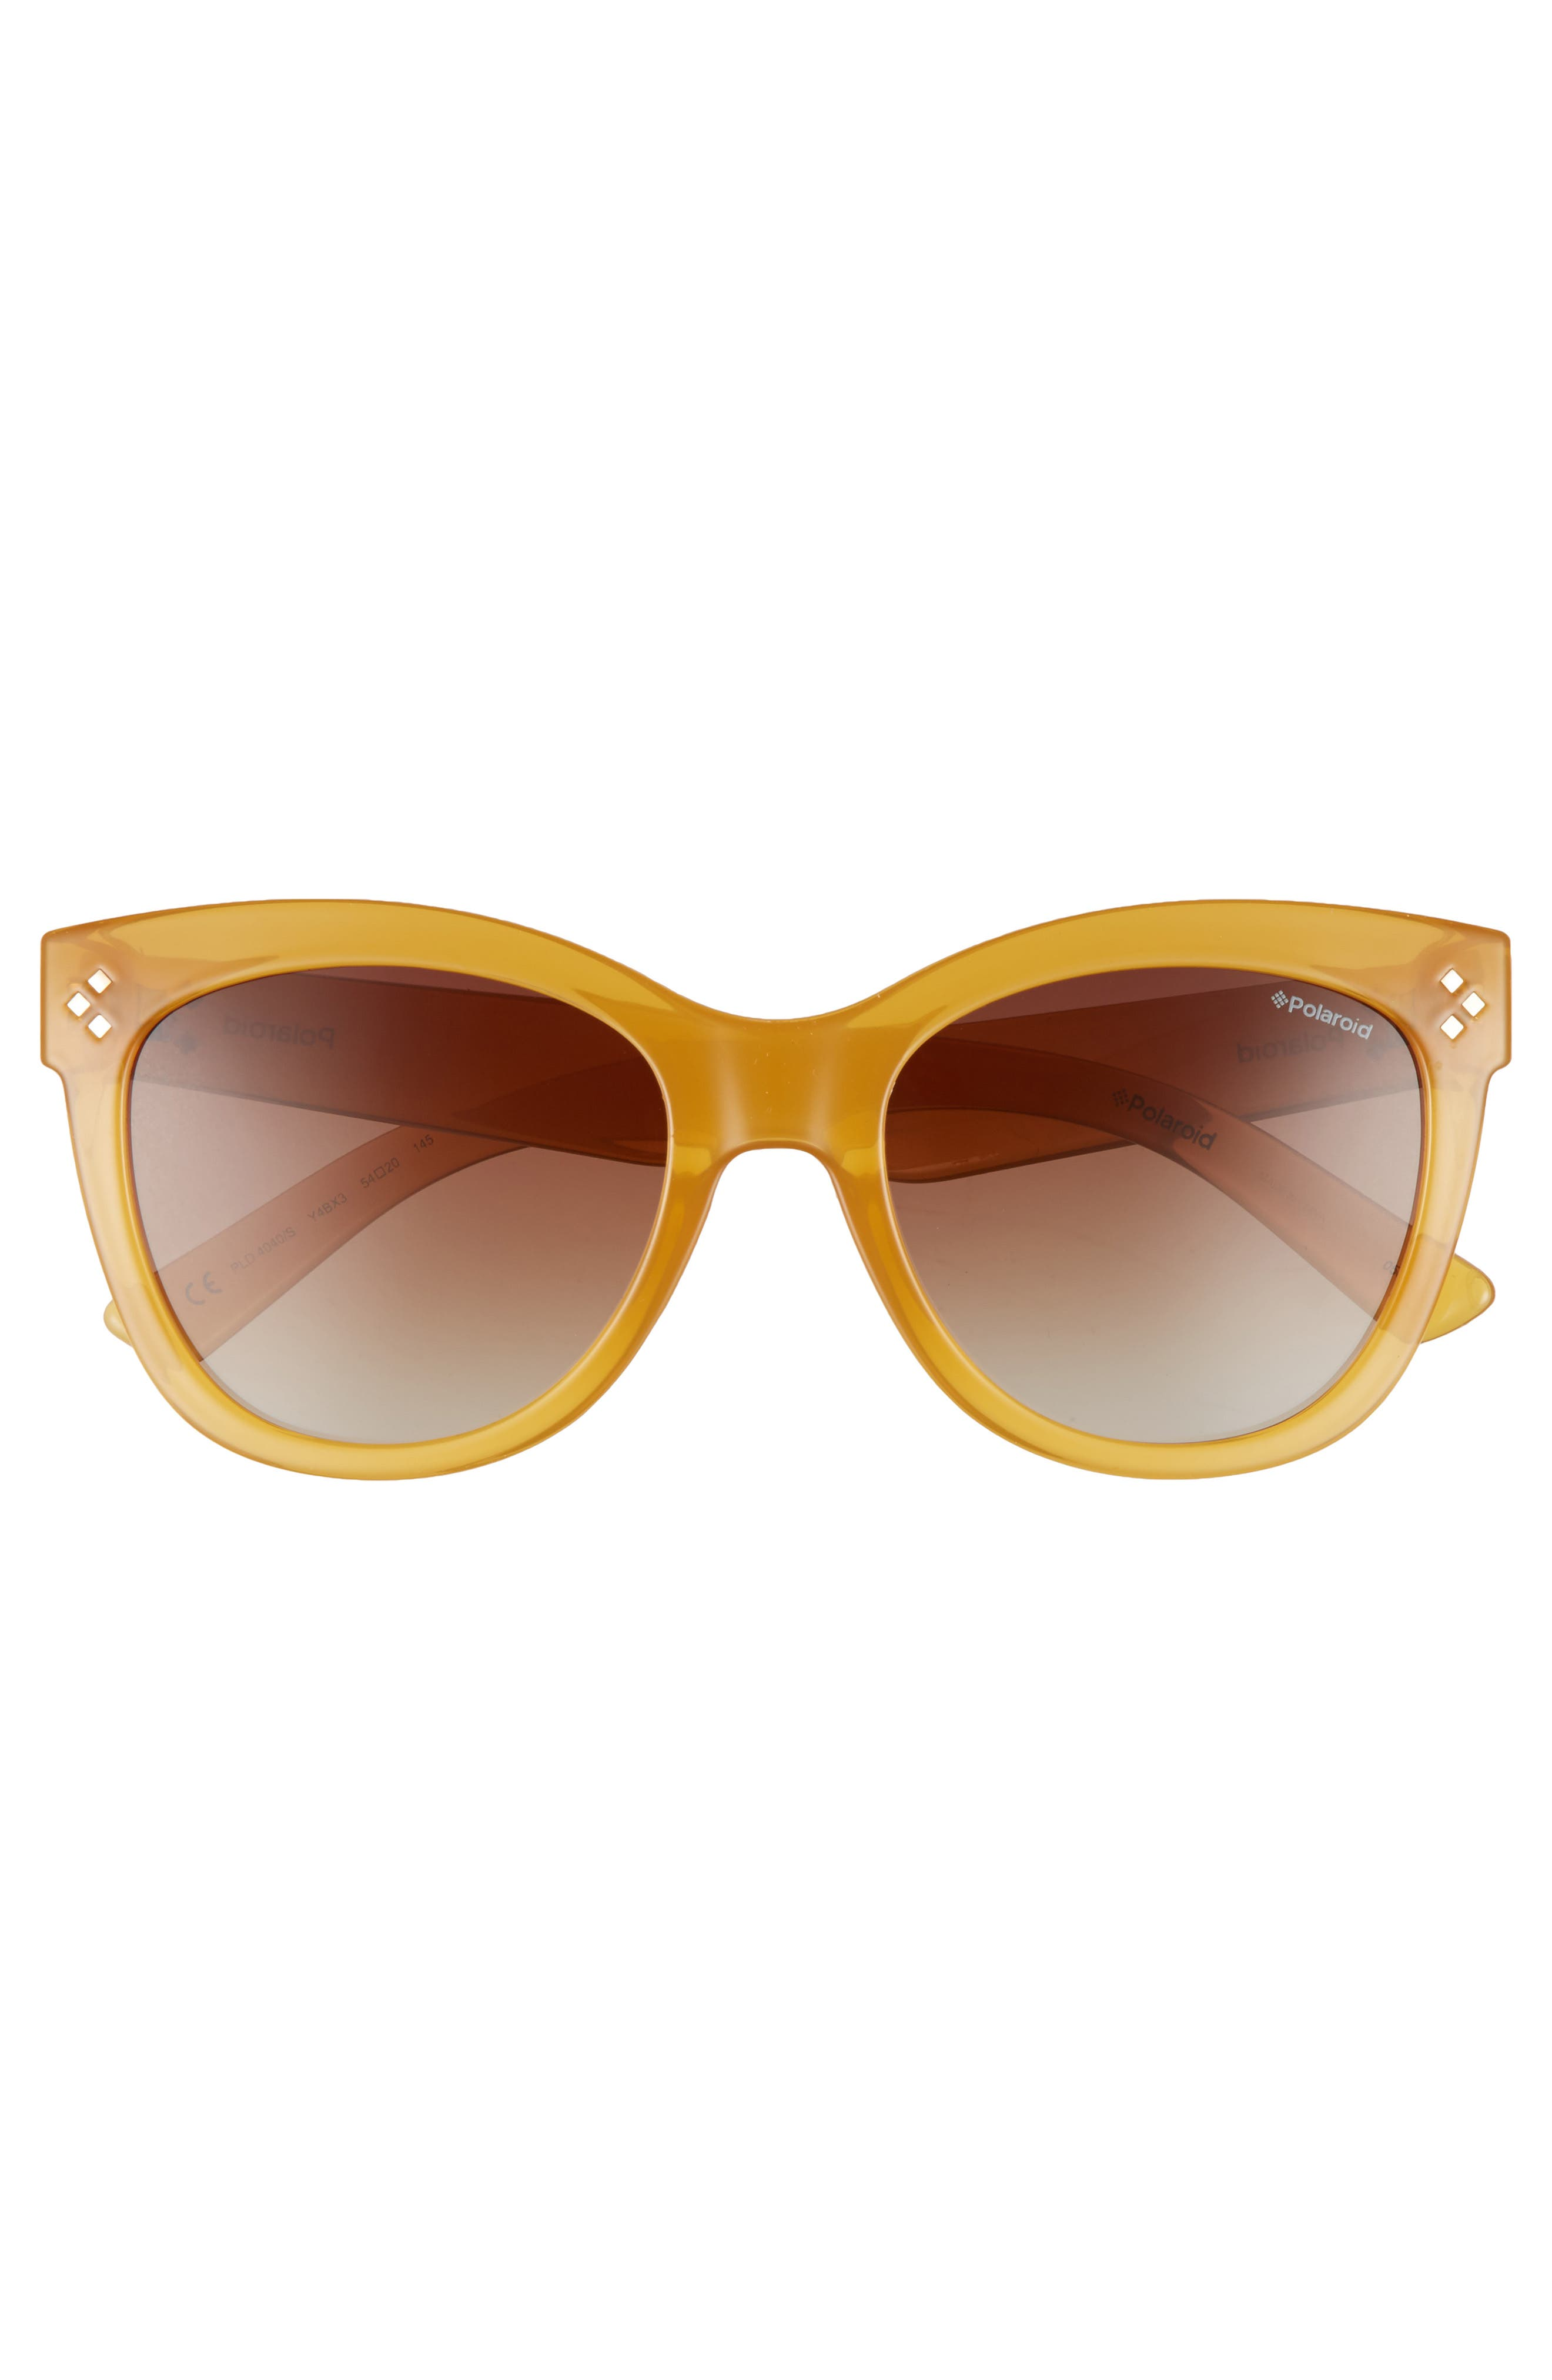 54mm Polarized Sunglasses,                             Alternate thumbnail 3, color,                             700